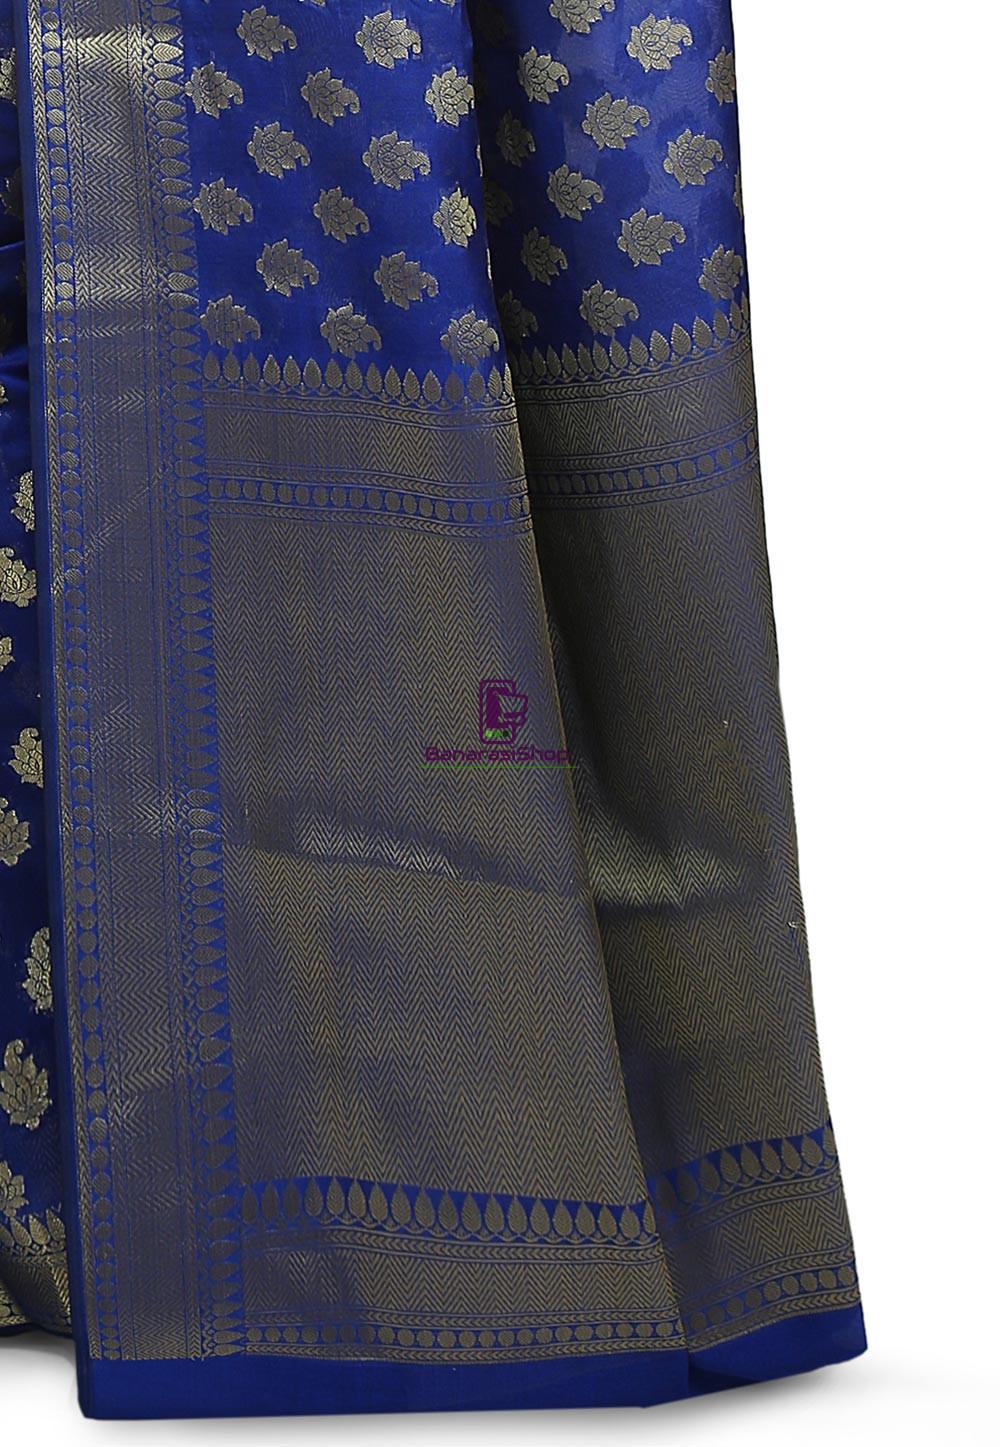 Banarasi Saree in Royal Blue 3